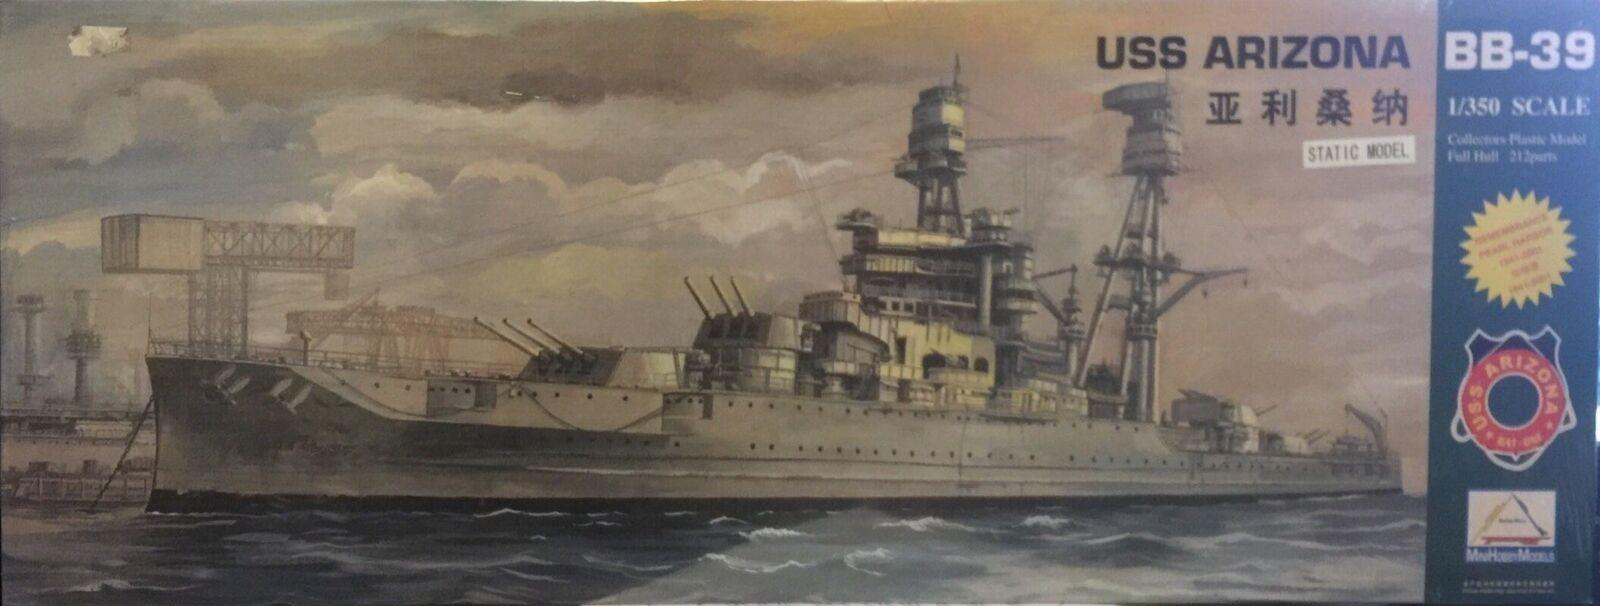 Mini Hoby Models USS Arizona BB-38 Ref 80607 Escala 1 350